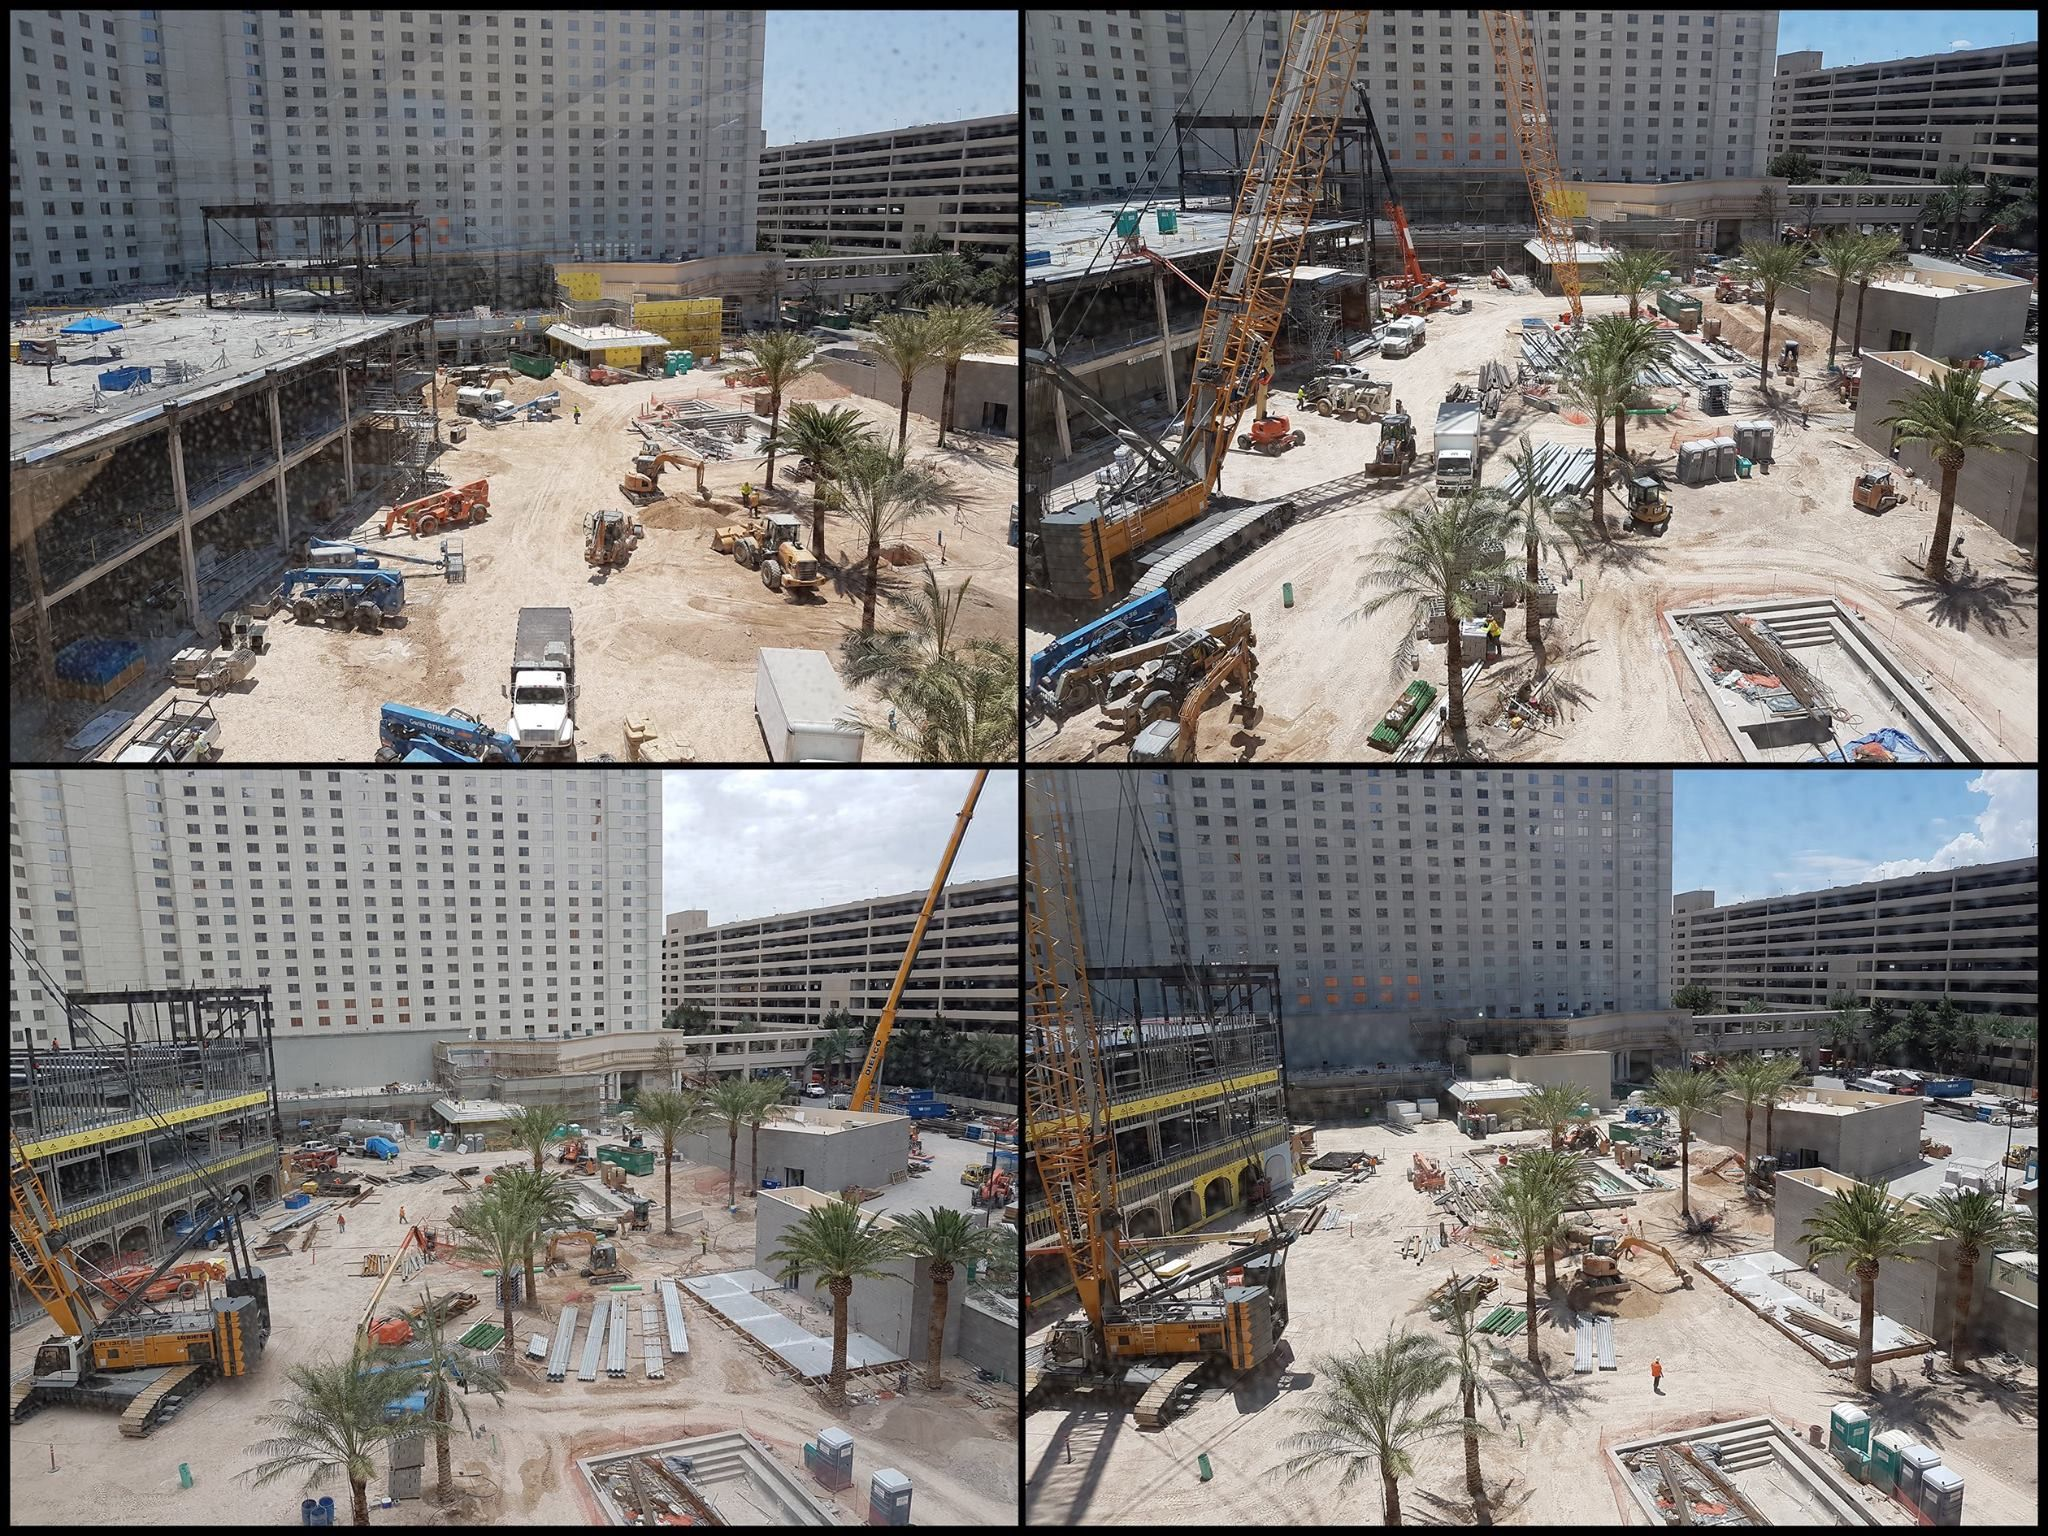 Vegas bright Monte Carlo construction photos as it becomes